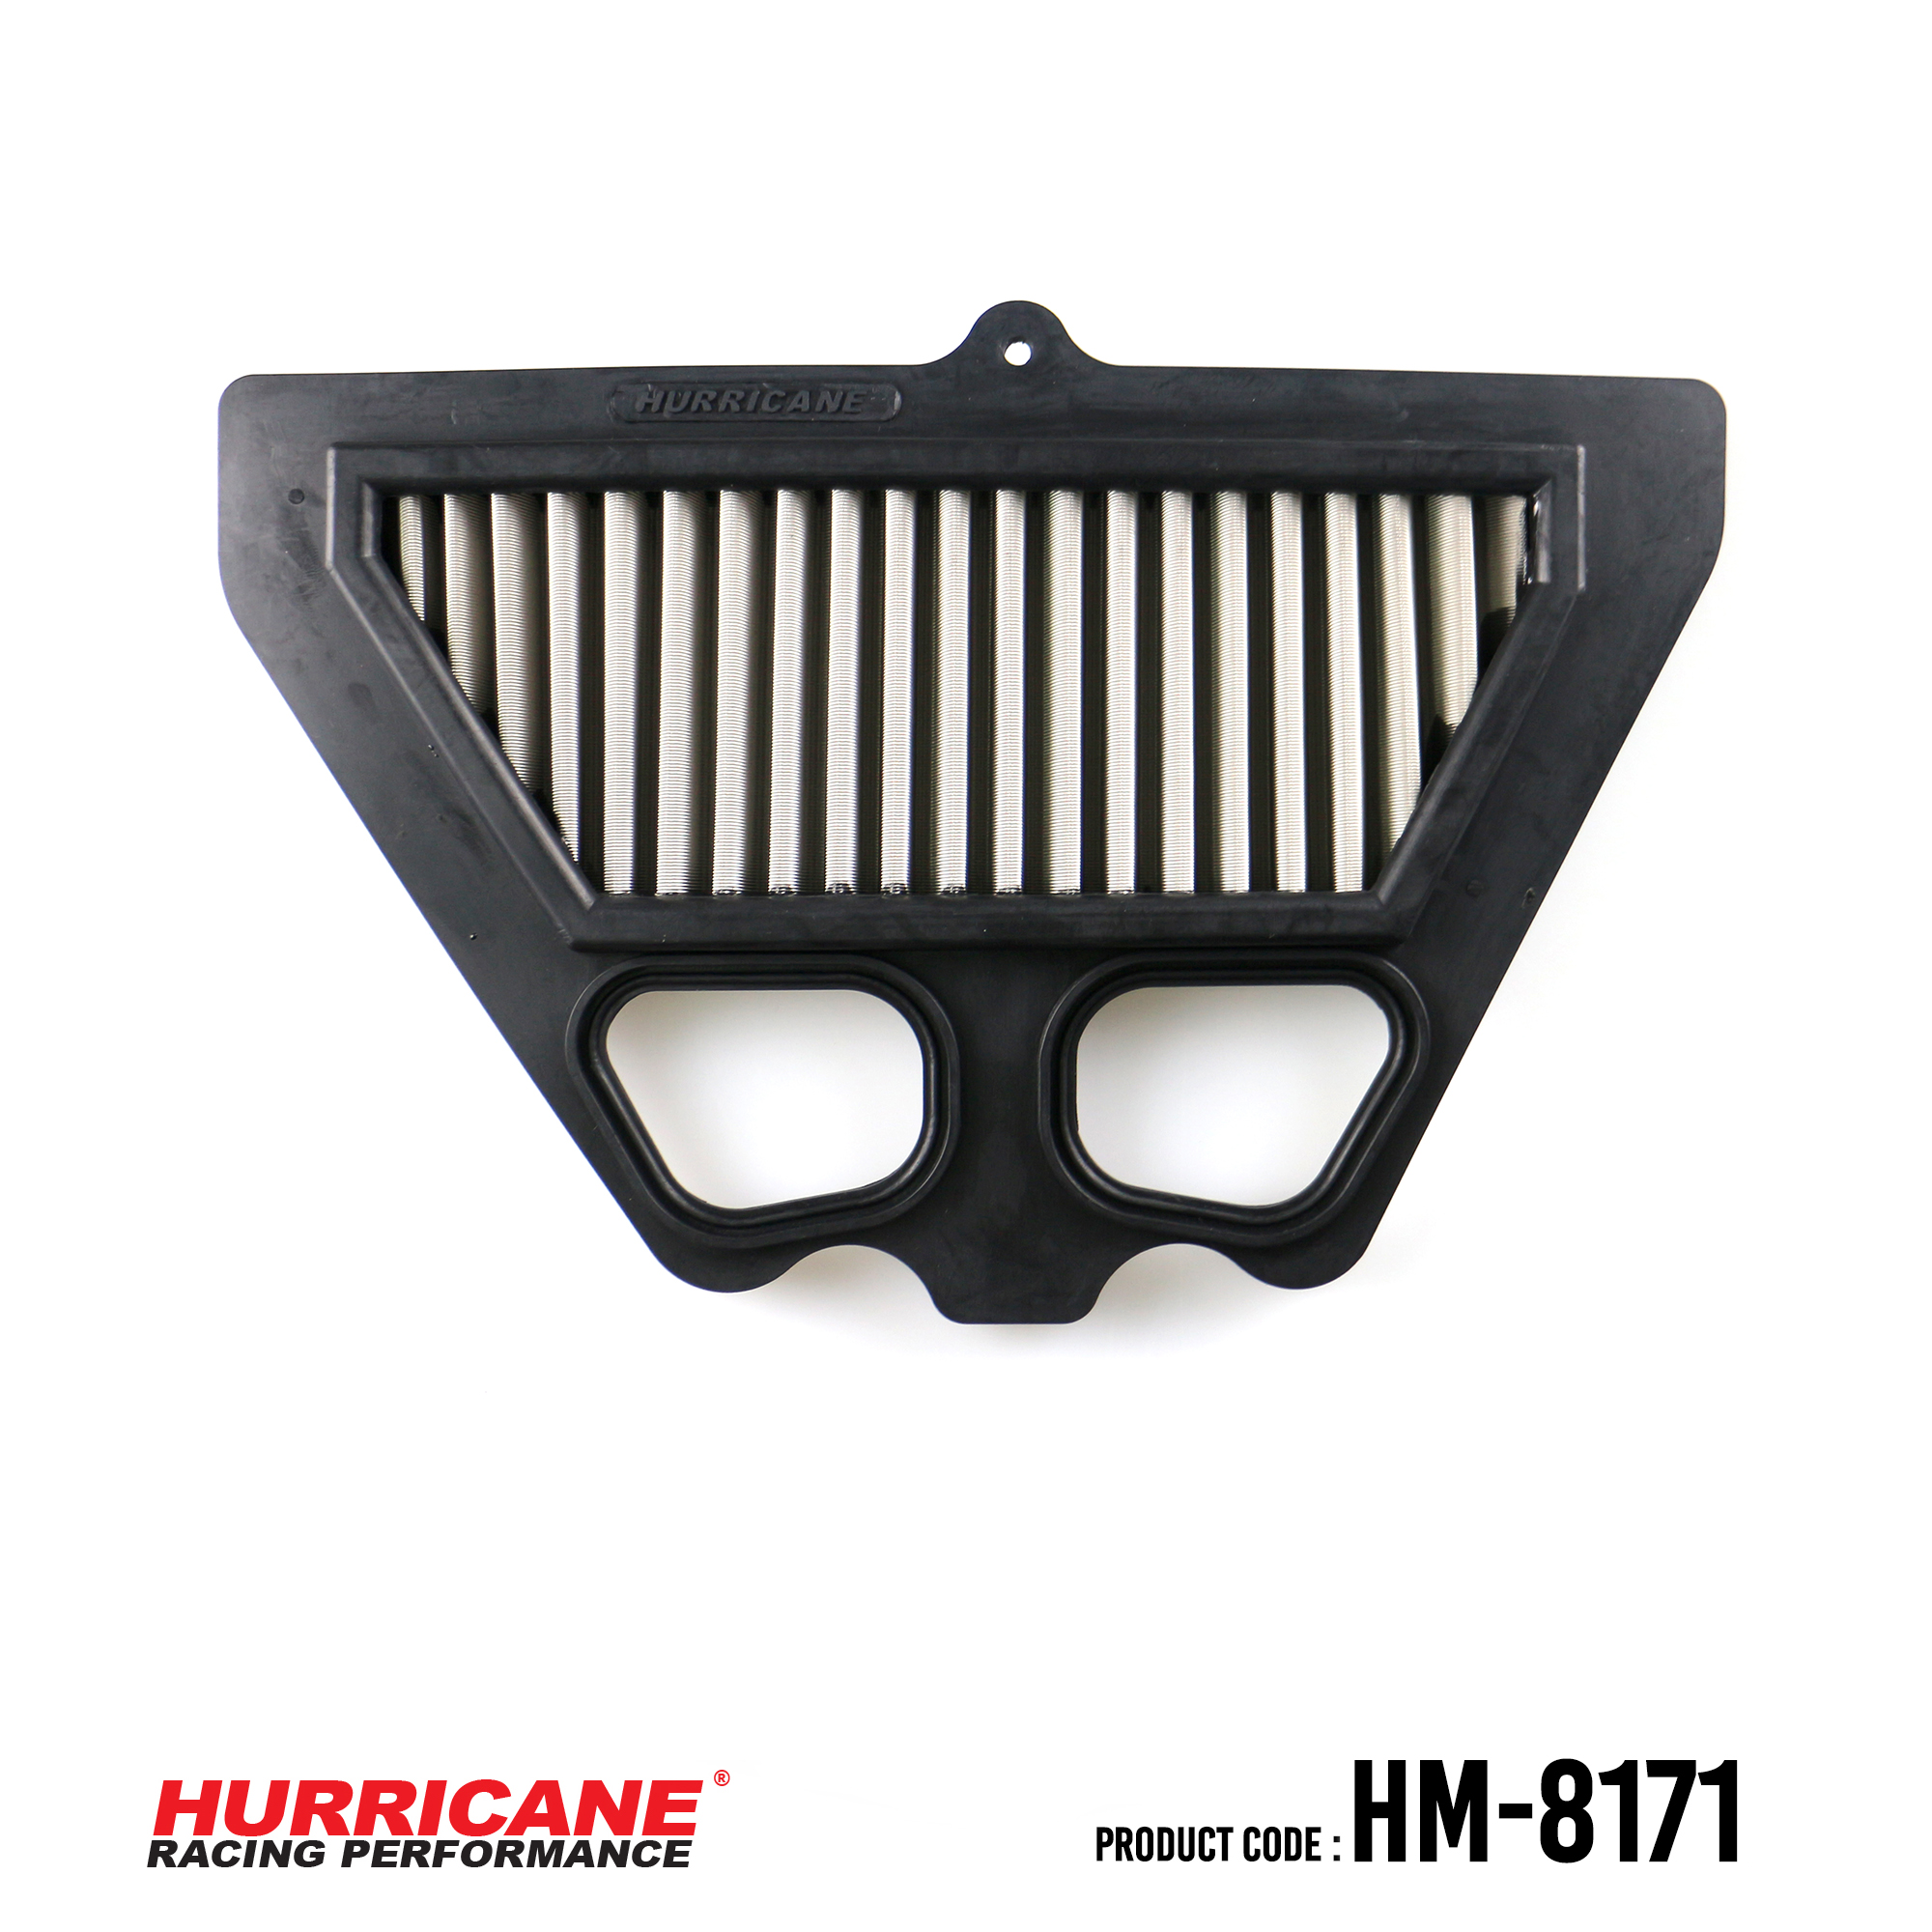 HURRICANE STAINLESS STEEL AIR FILTER FOR HM-8171 Kawasaki